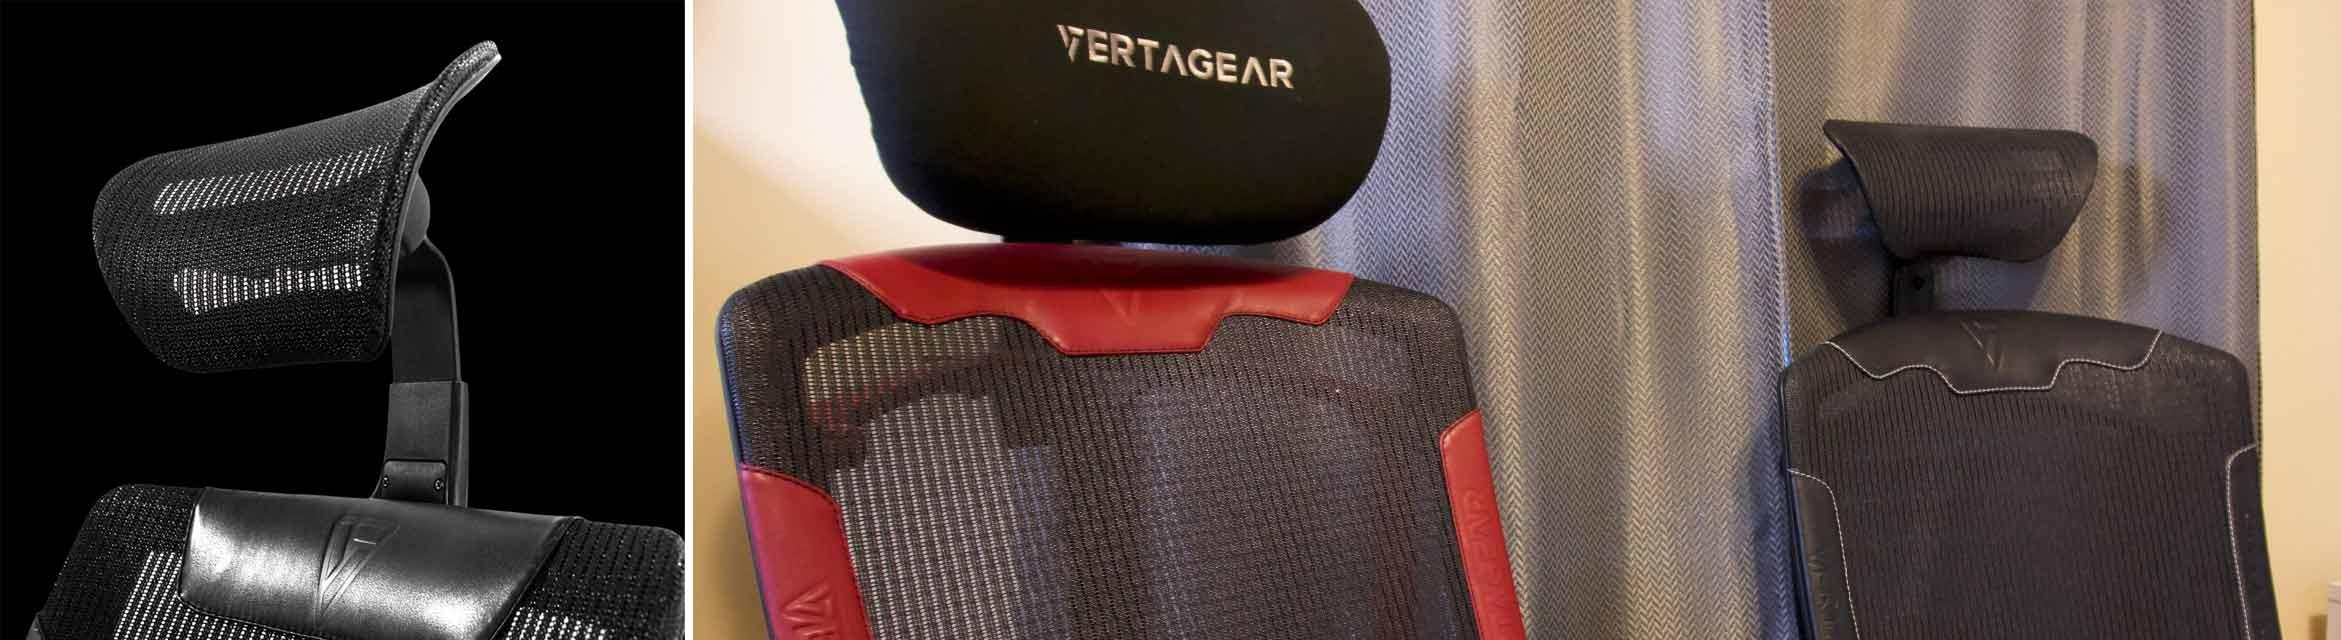 gaming chairs  - صندلی های بازی - Vertagear-Gaming-Series-Triigger-350-Special-Edition---gaming-chair---معرفی-و-انواع-صندلی-های-بازی---صندلی-گیمینگ